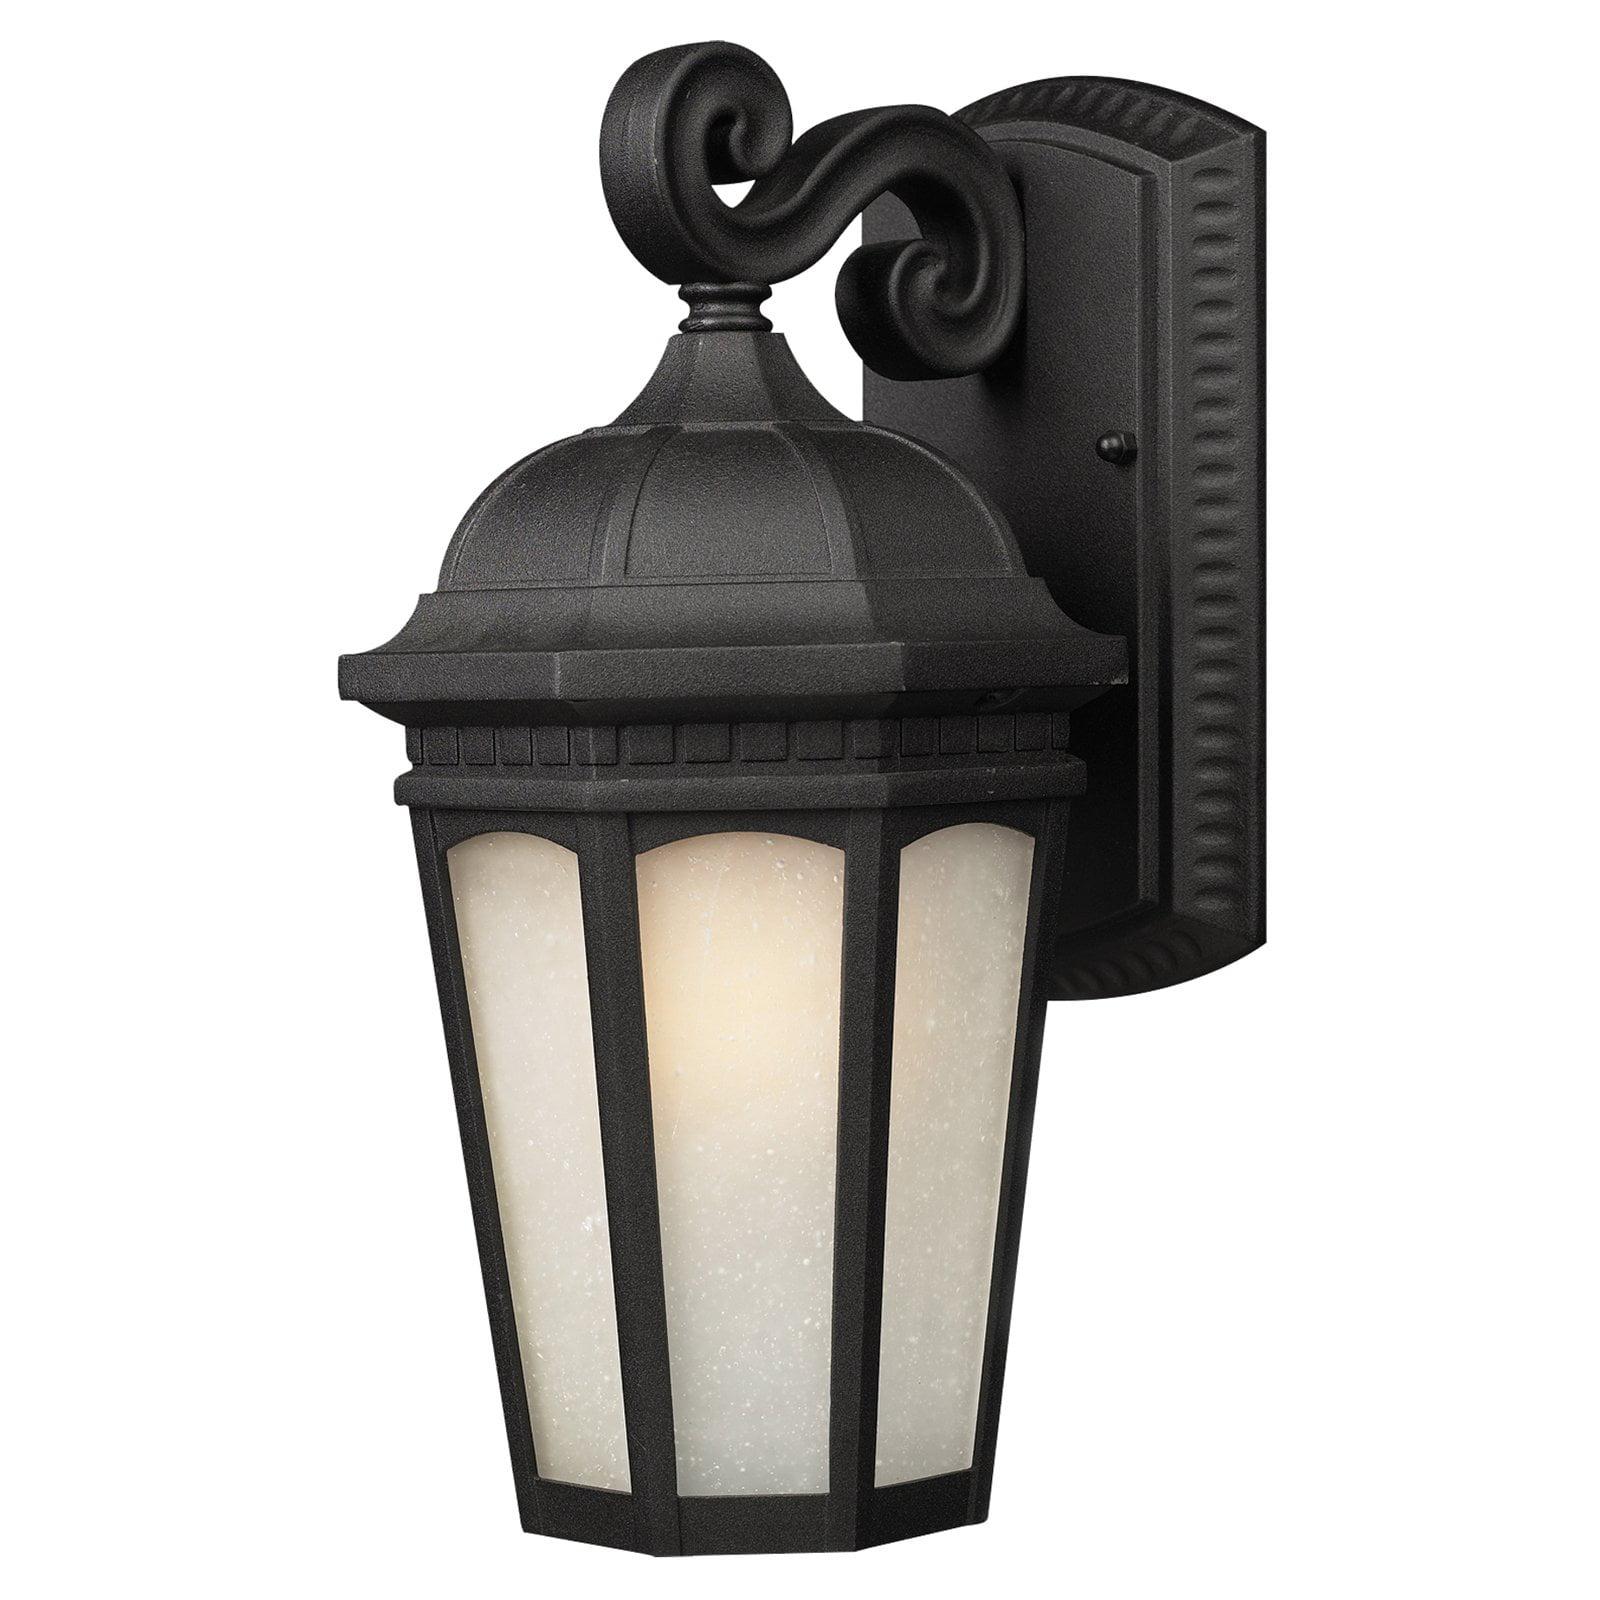 Z-Lite Newport Outdoor Wall Light in Black